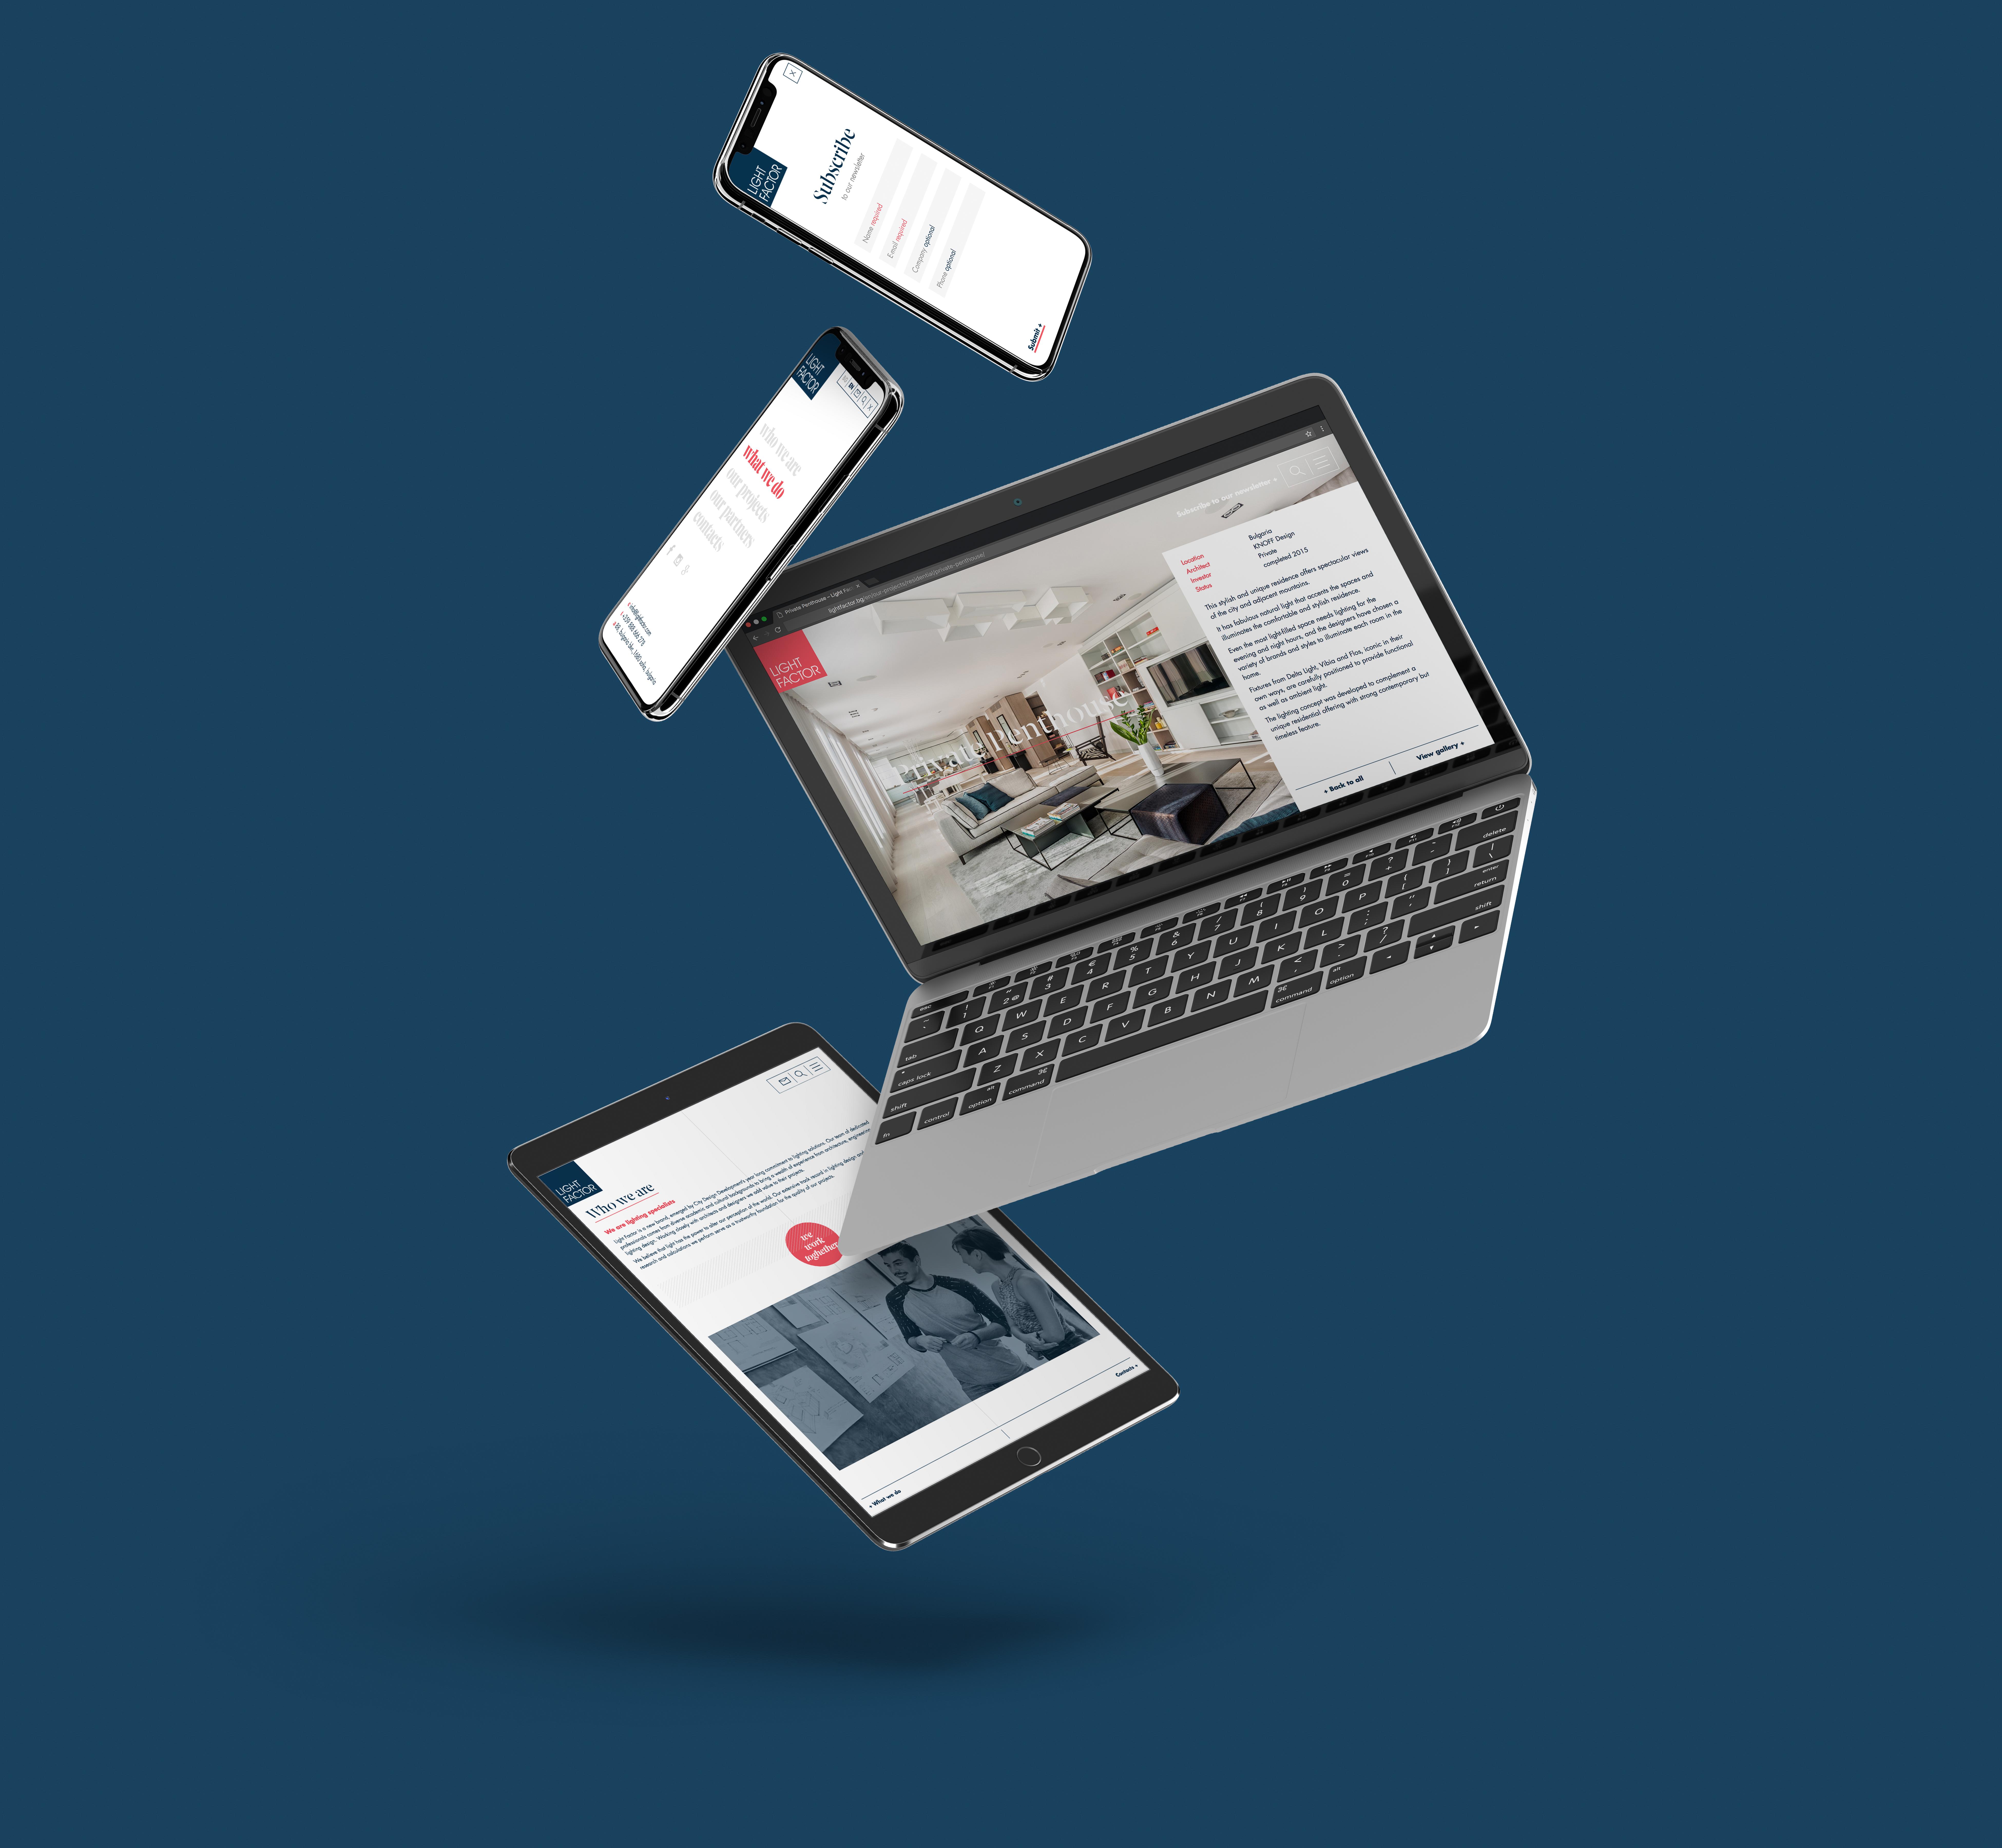 LF-Gravity-Devices-UI-Presentation-Mockup.jpg